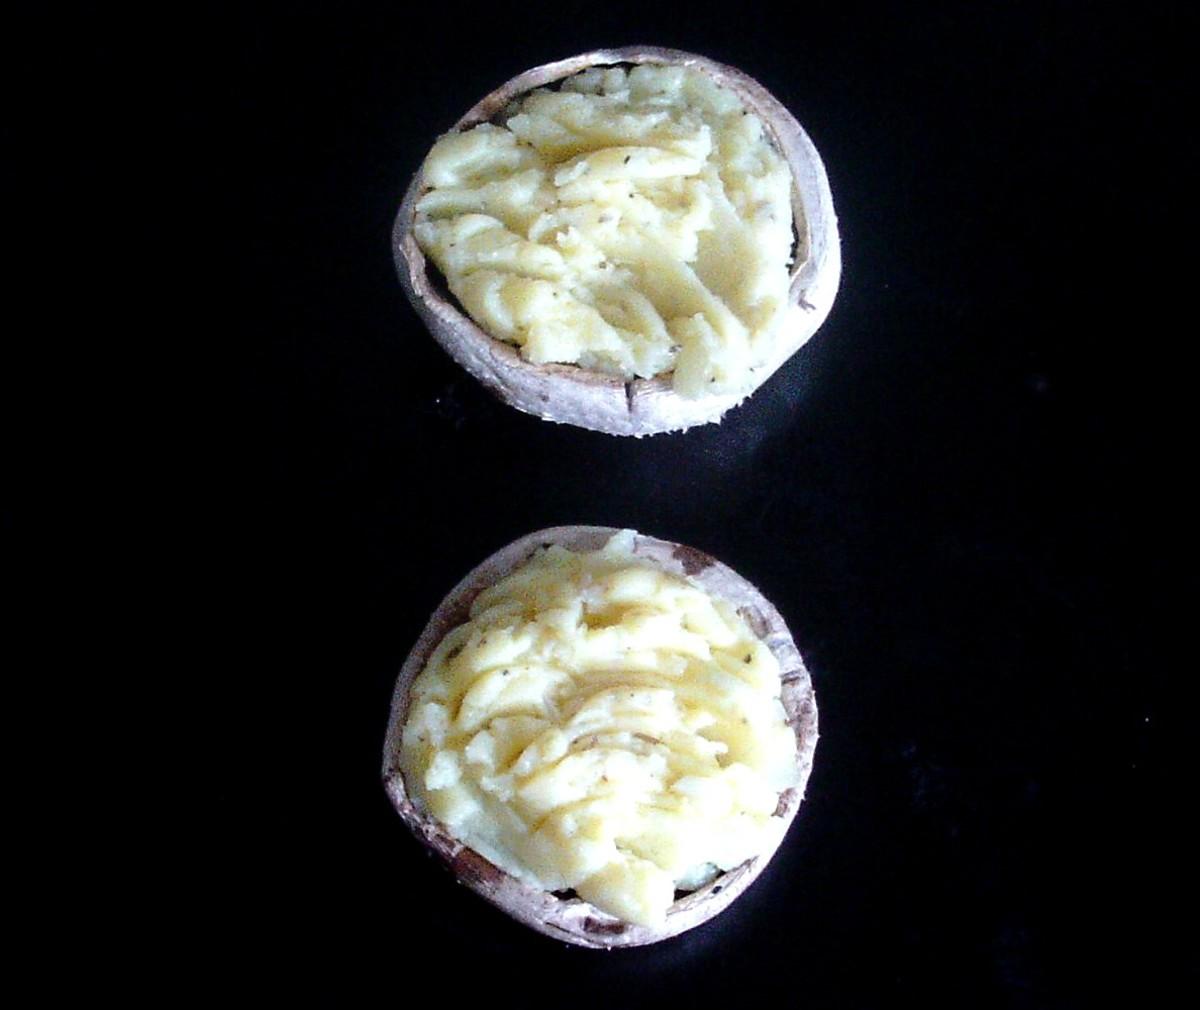 Potato stuffed mushrooms